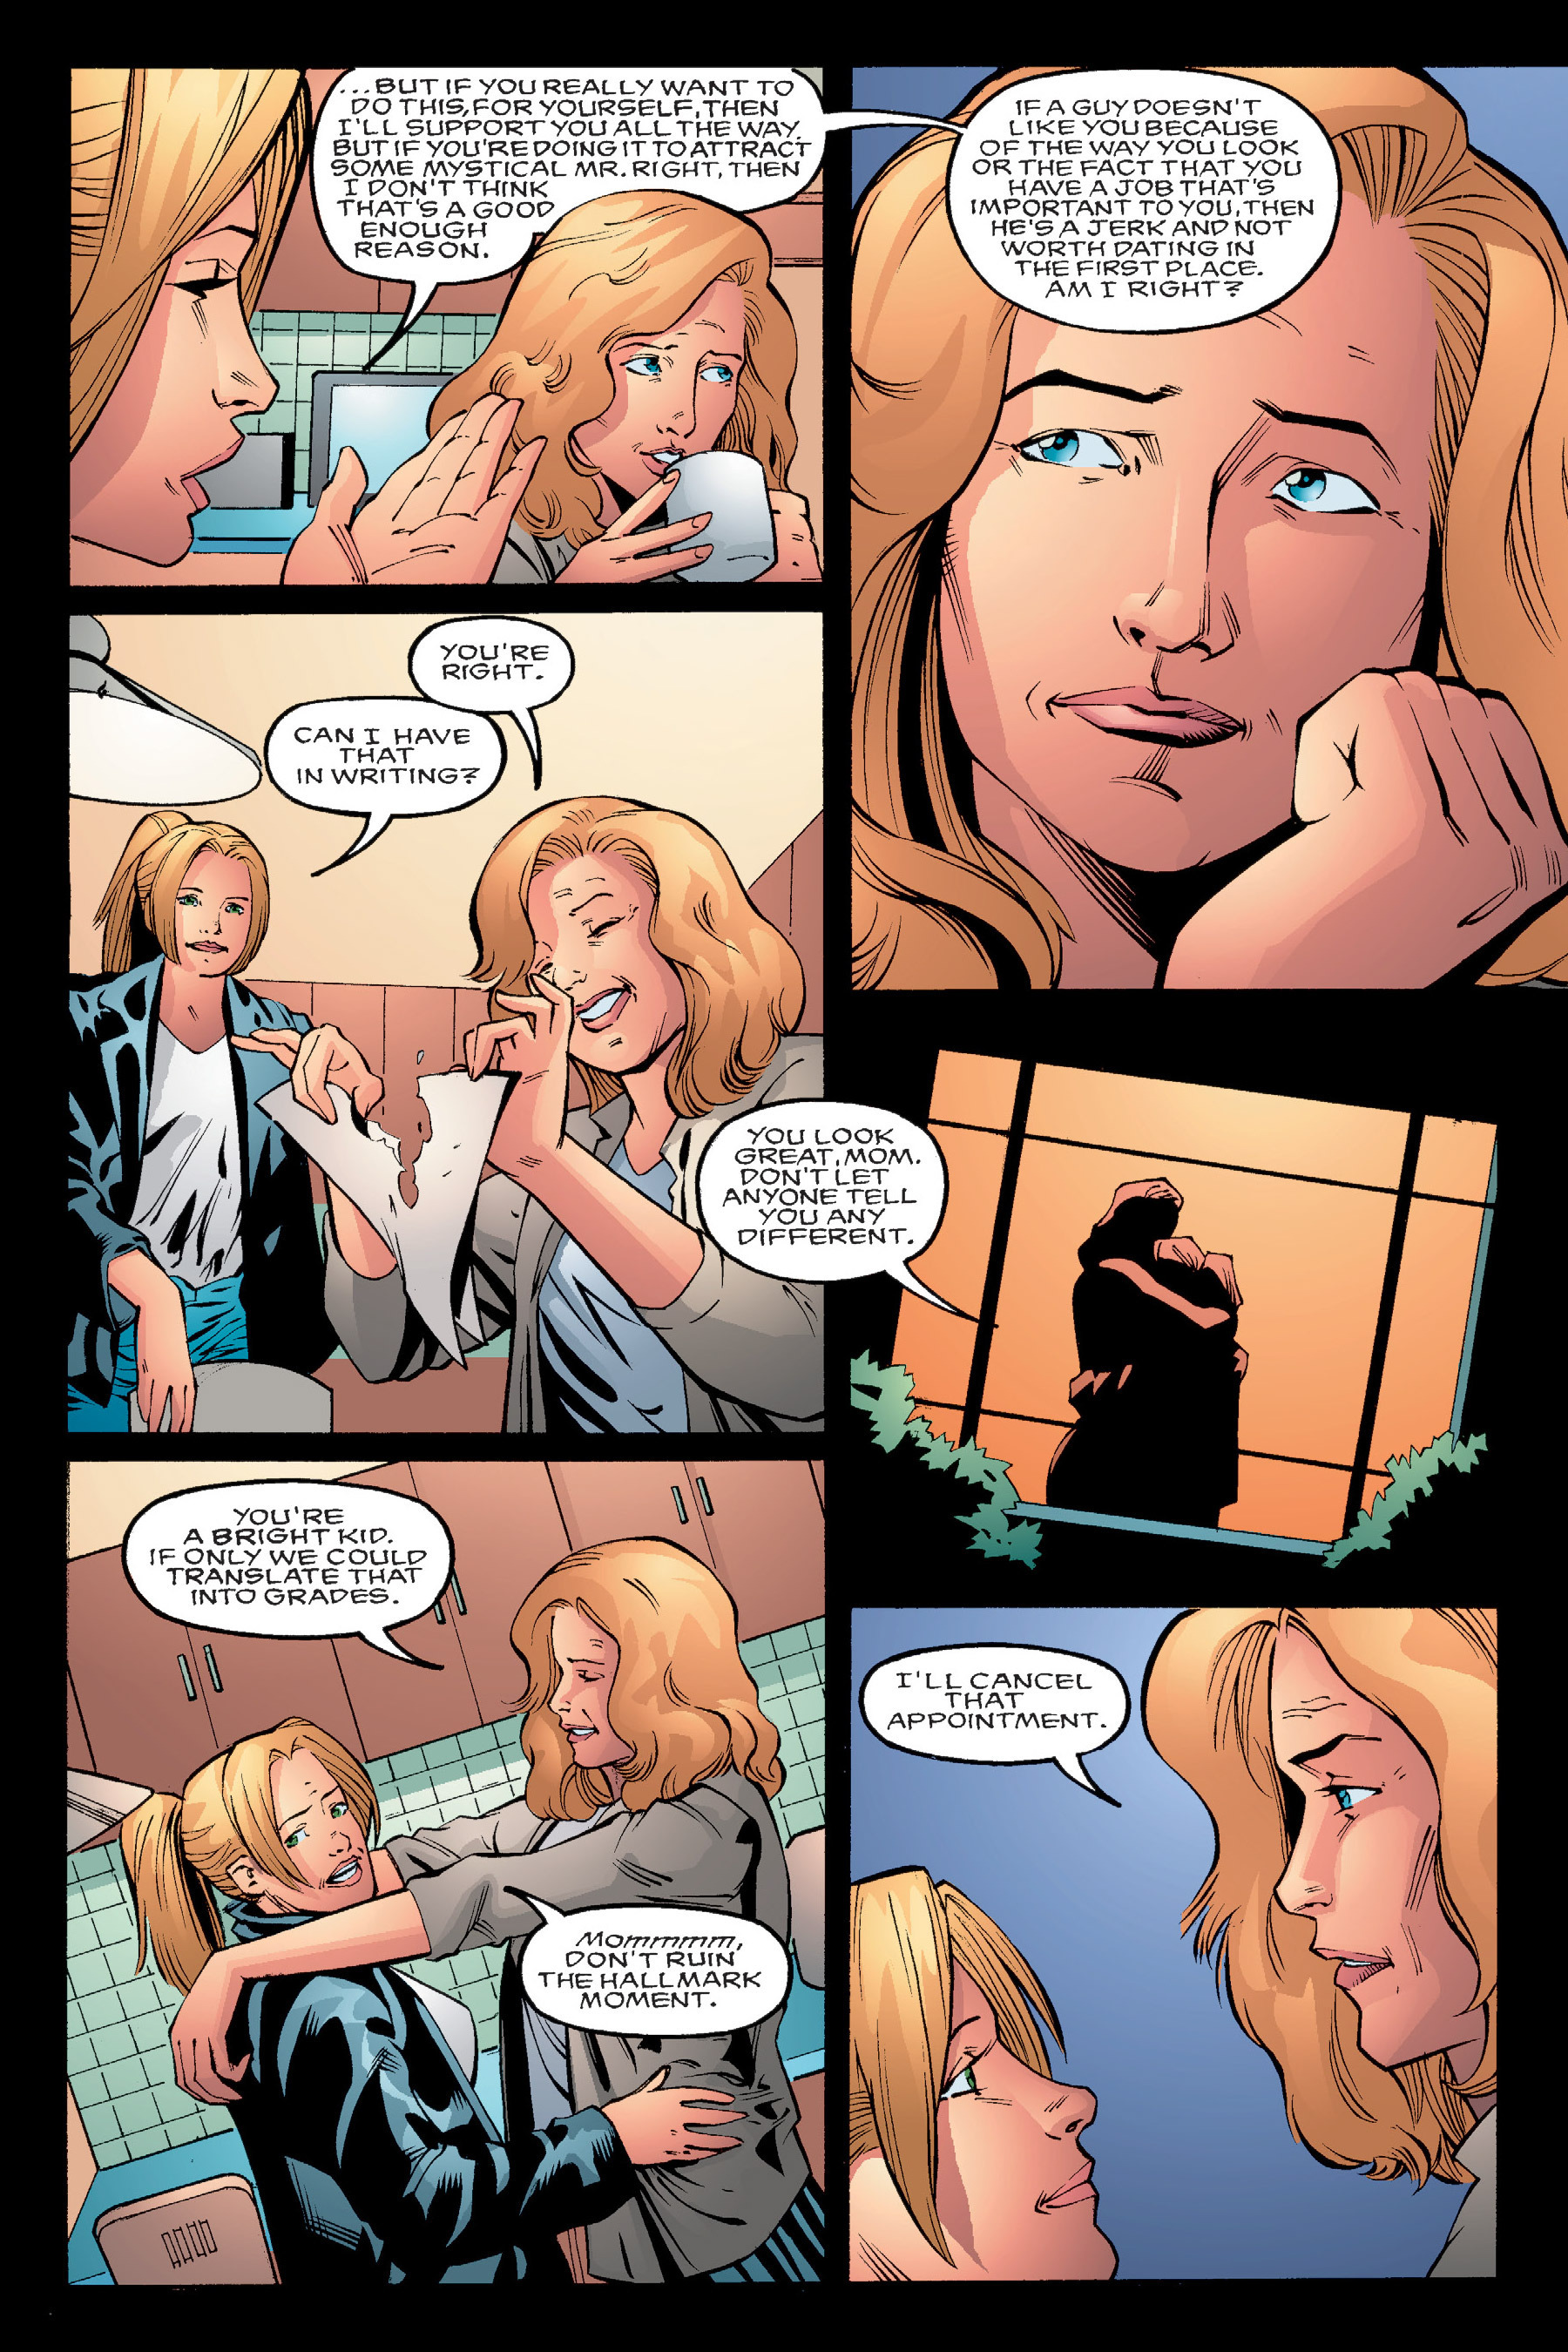 Read online Buffy the Vampire Slayer: Omnibus comic -  Issue # TPB 4 - 27